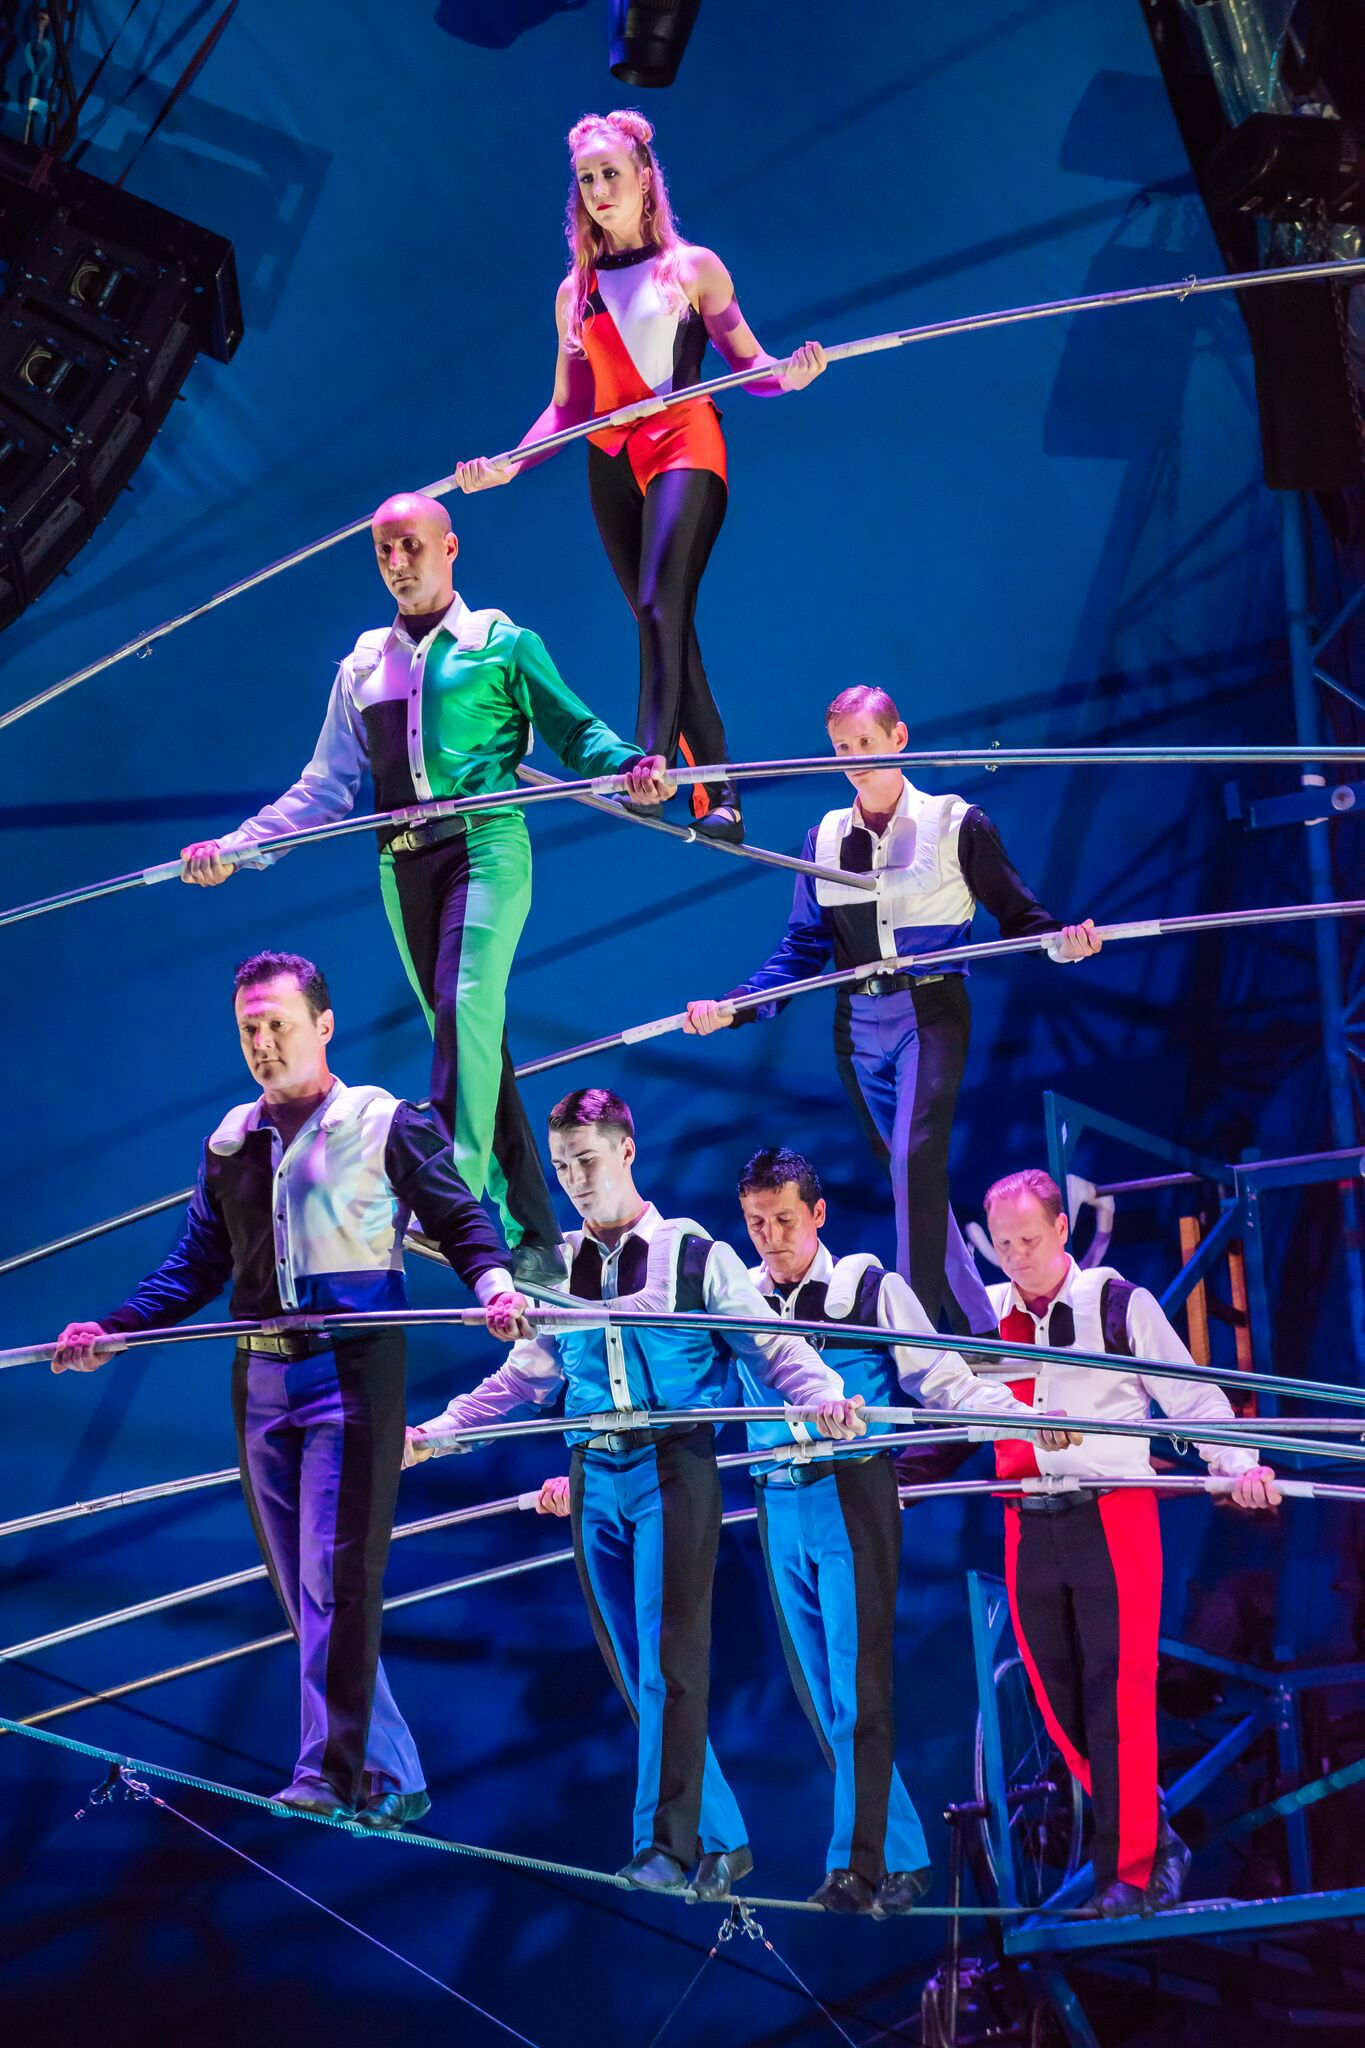 Big Apple Circus. Big Apple Circus Coming to Alpharetta, GA